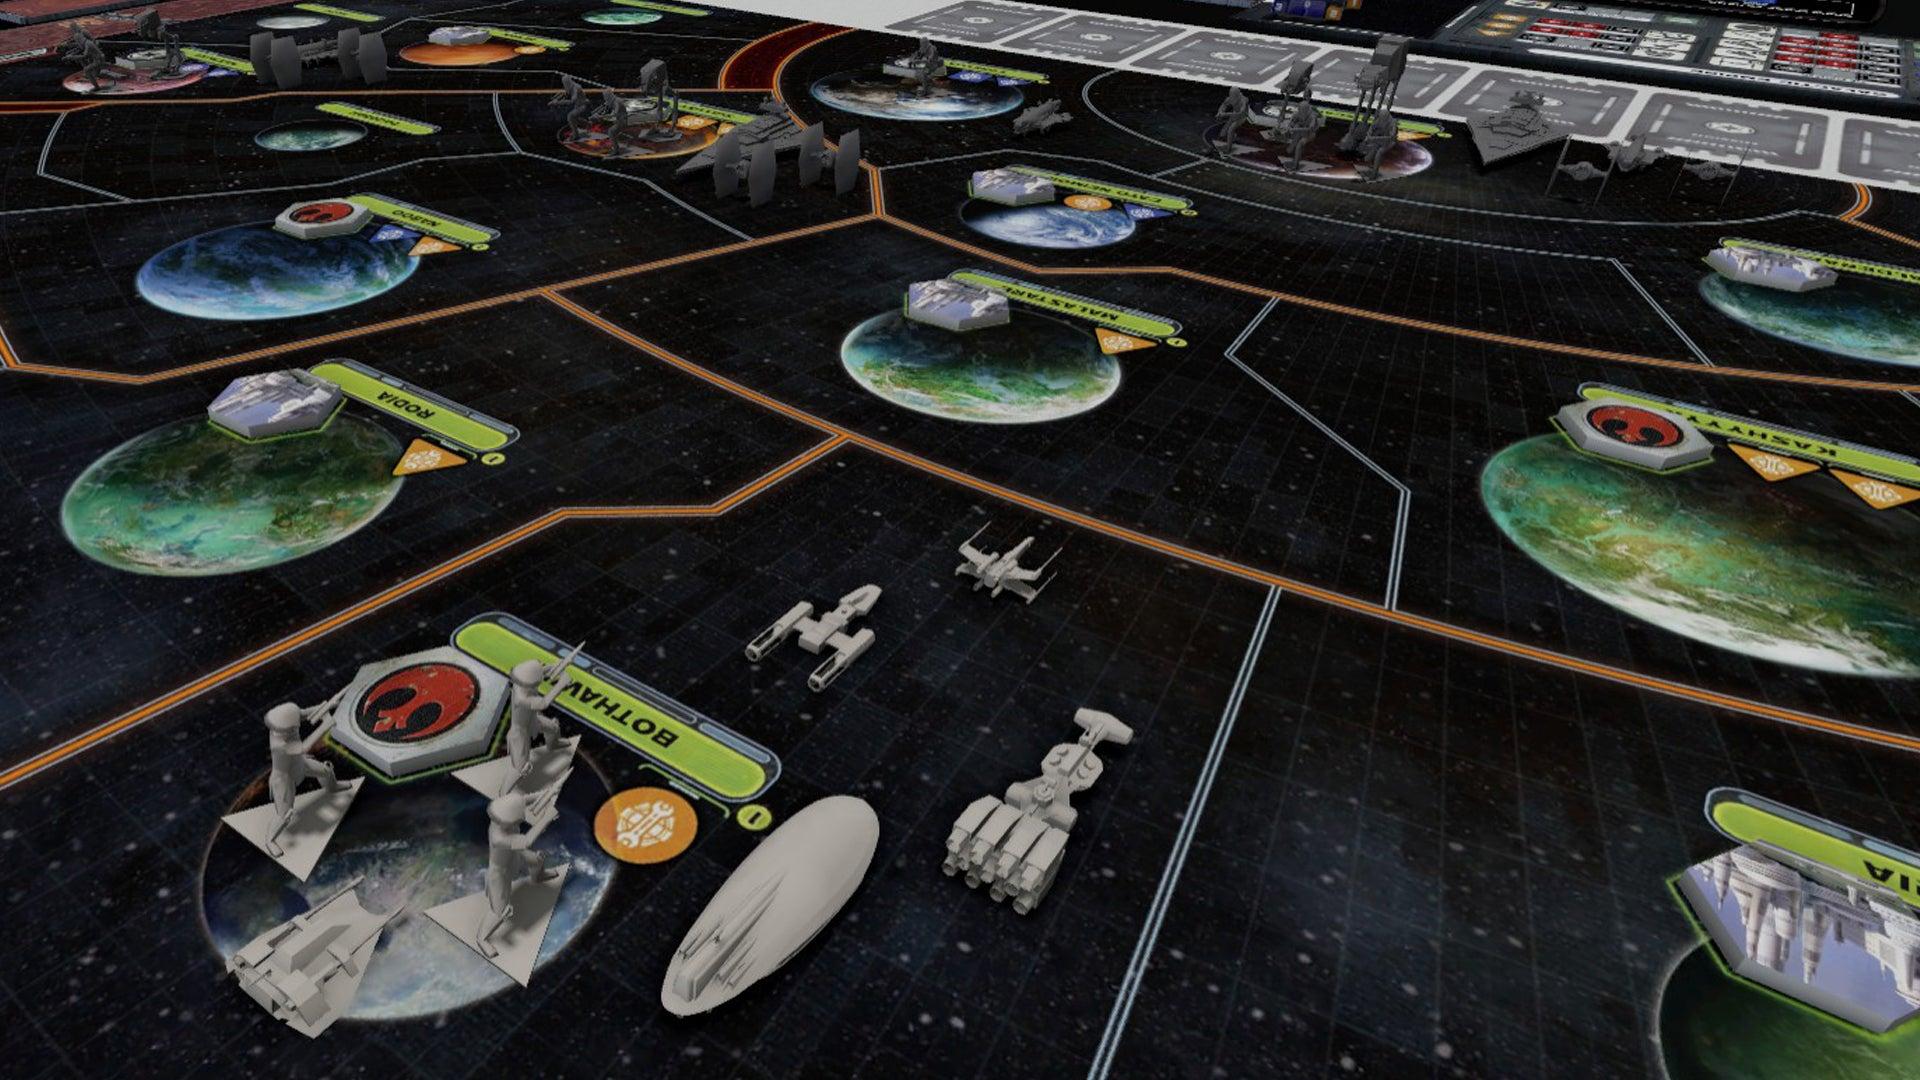 tabletop-simulator-mod-star-wars-rebellion.jpg